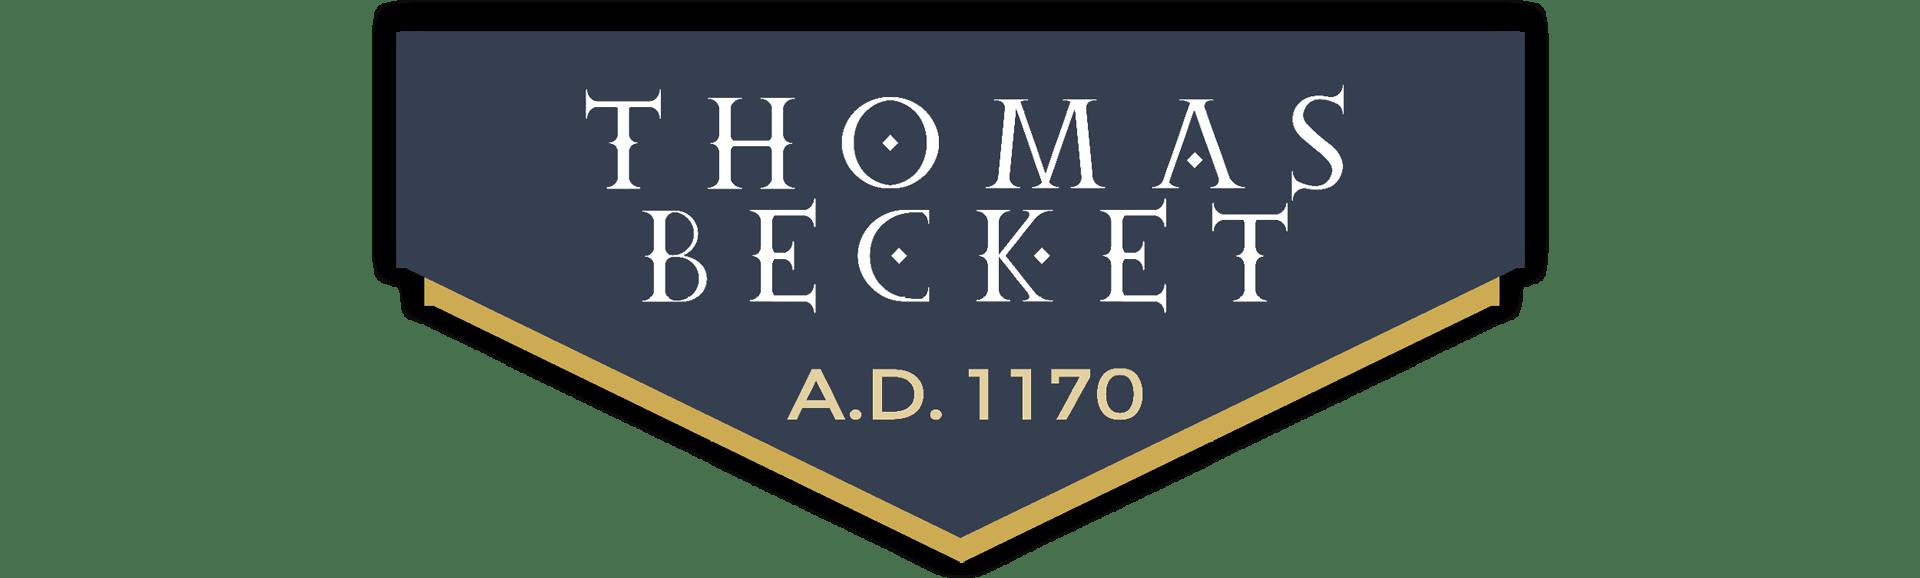 Becket AD 1170